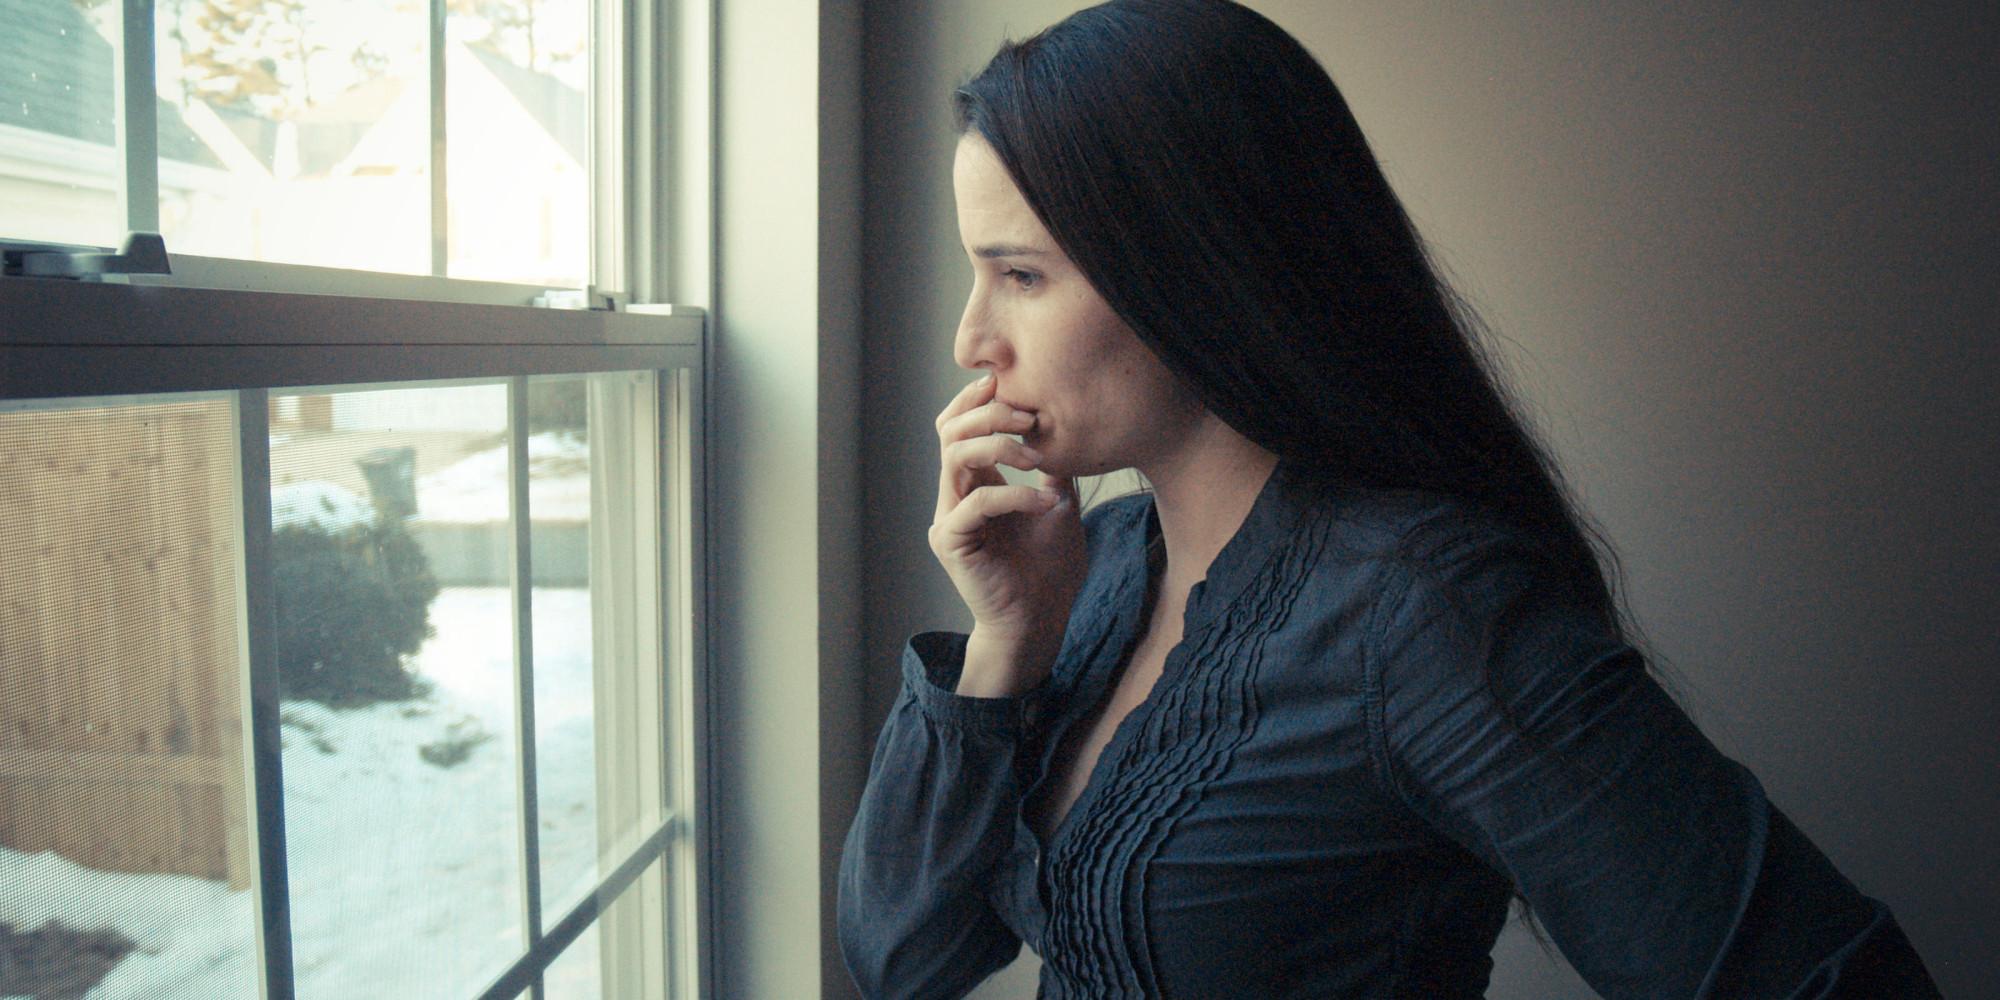 Male depression at 50